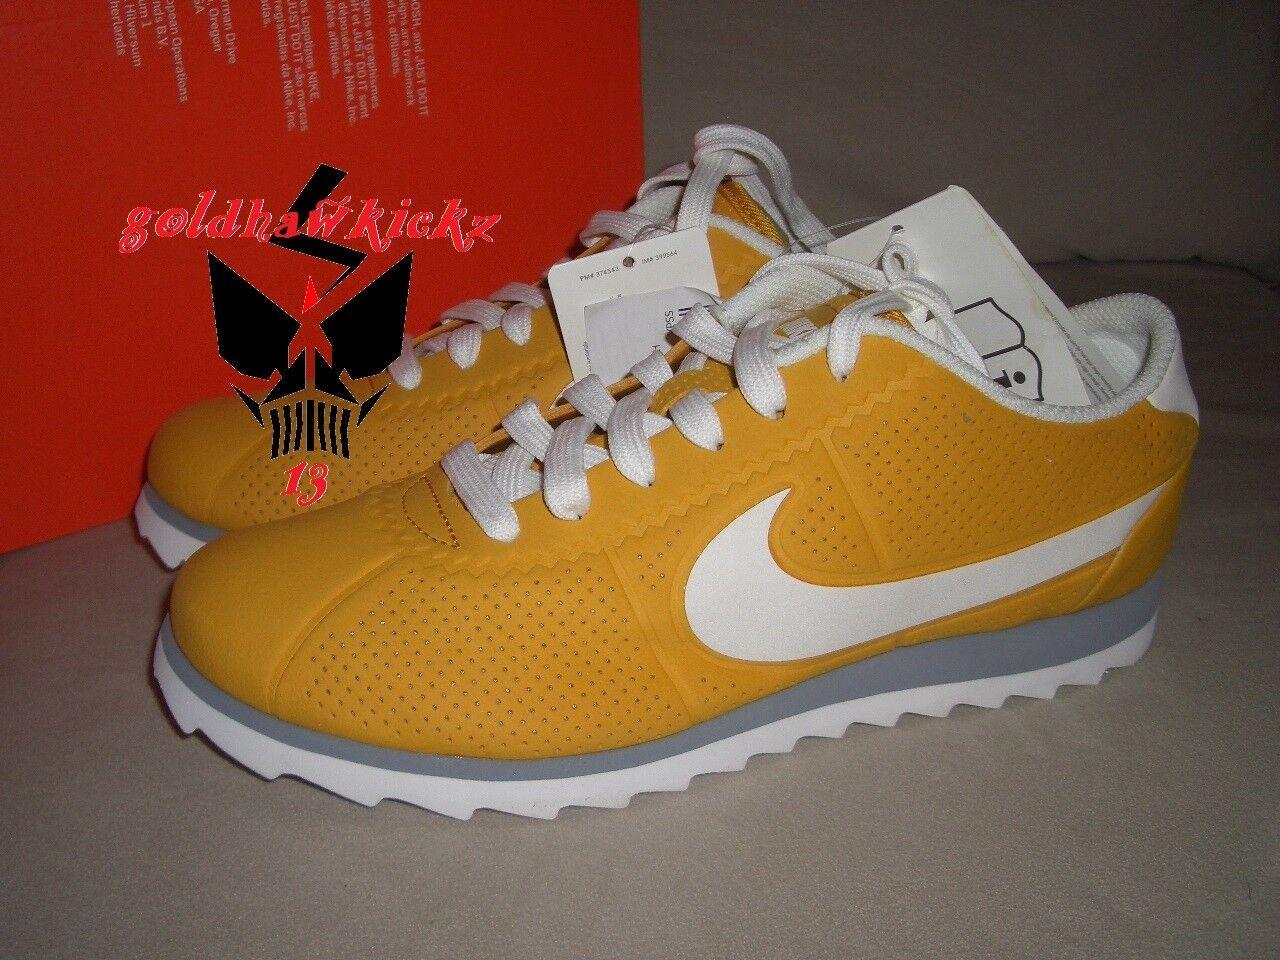 Nike cortez ultra moire gold dart summit yellow 844893 700 nikelab wmn